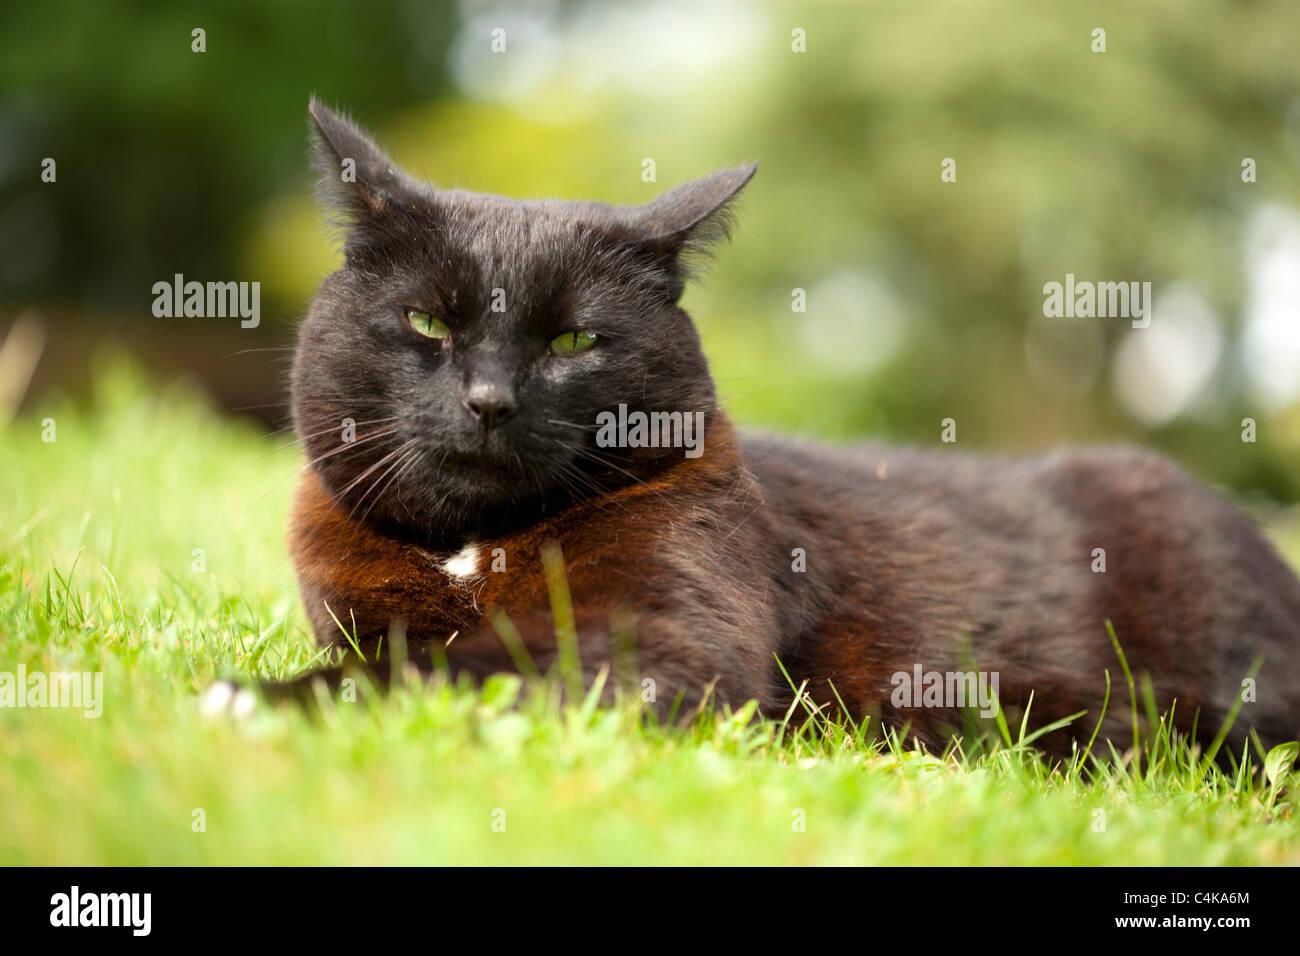 Gato negro sentado en la hierba mirando feroz Imagen De Stock